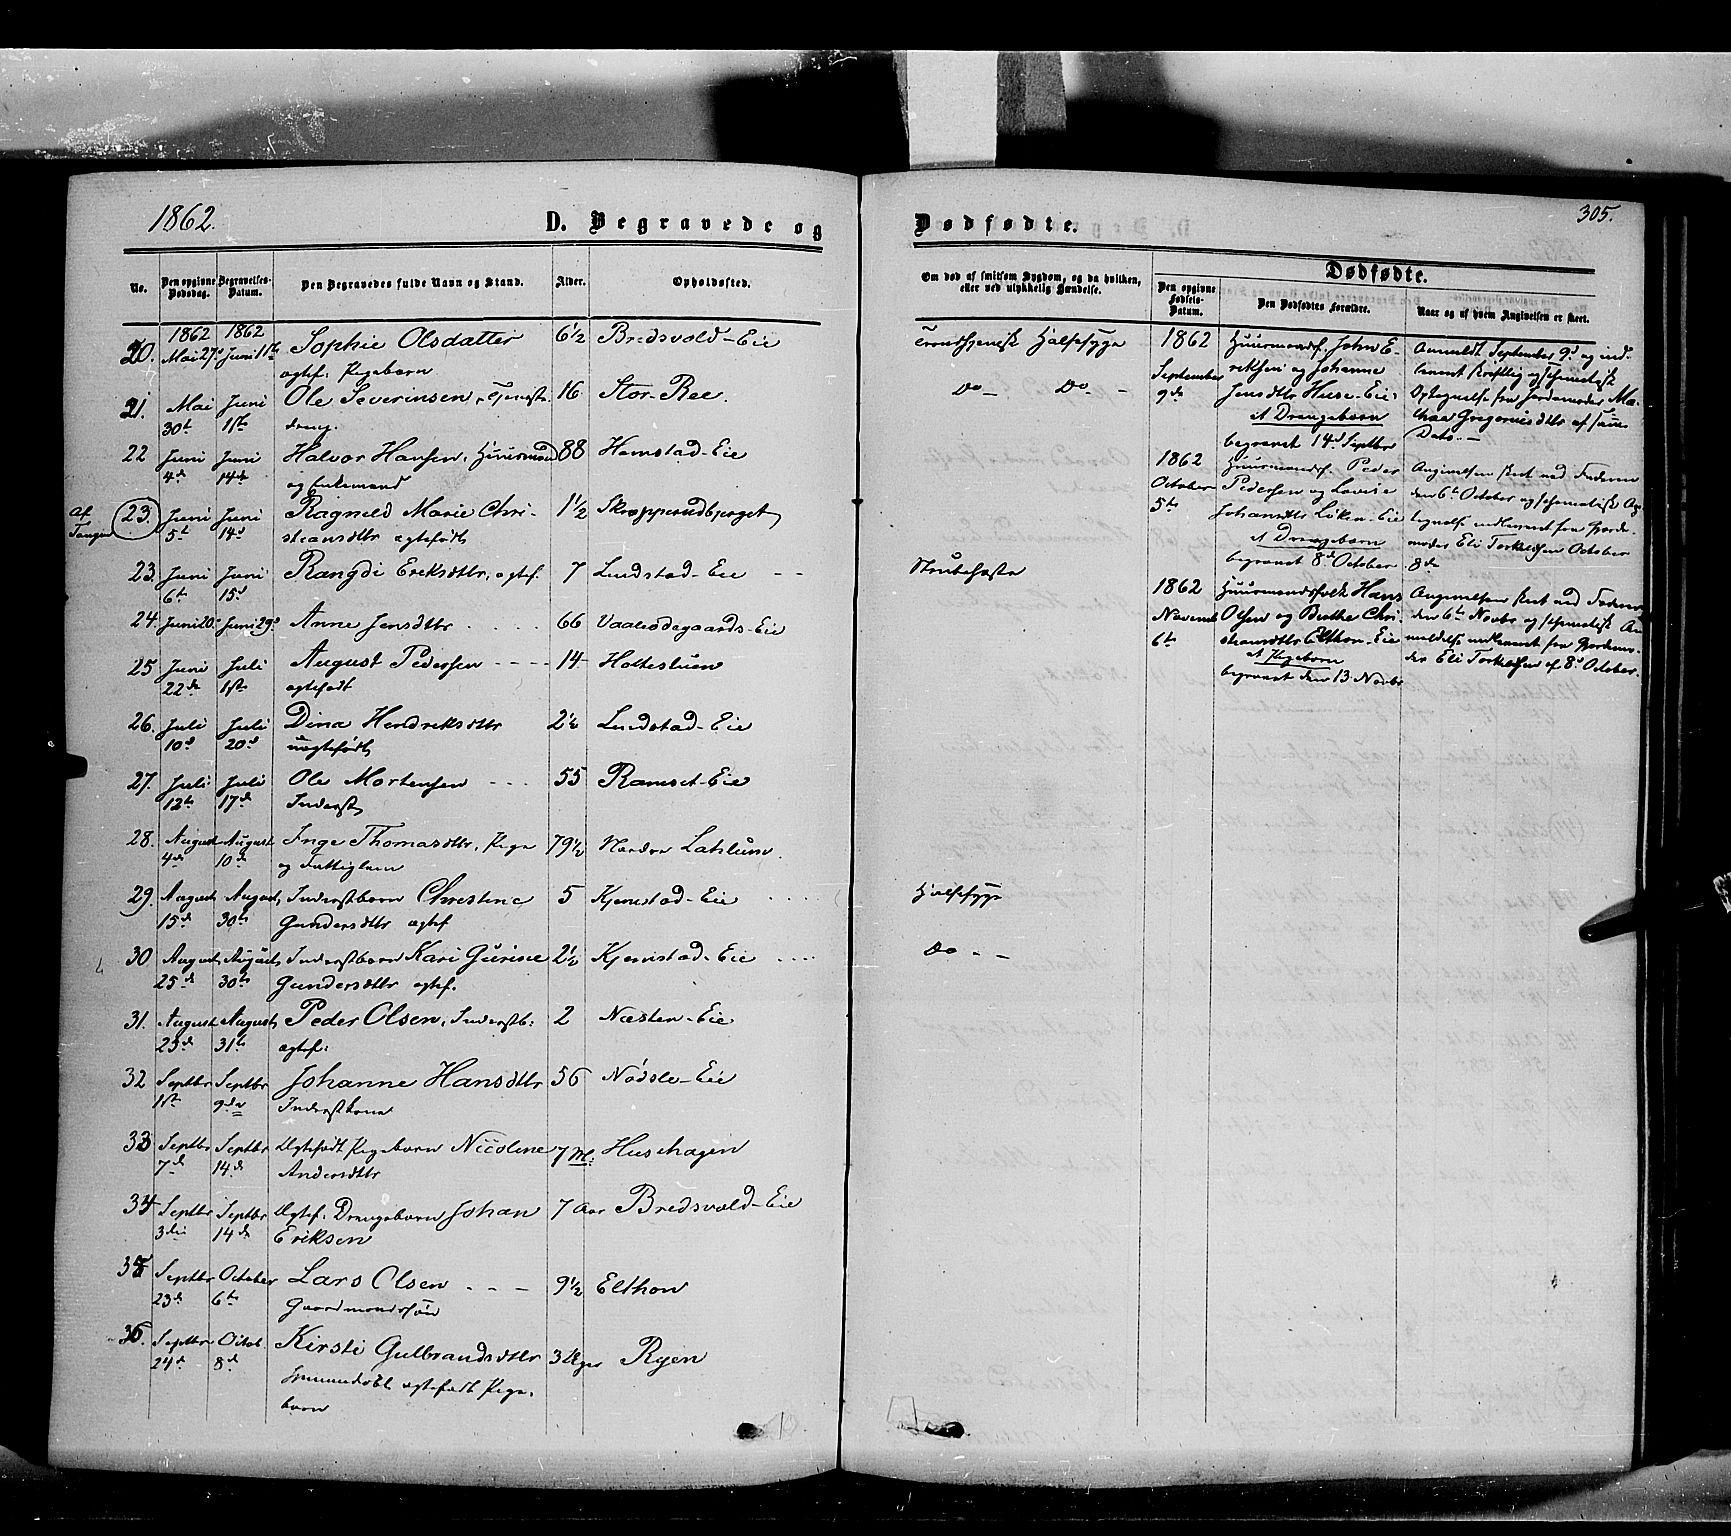 SAH, Stange prestekontor, K/L0013: Ministerialbok nr. 13, 1862-1879, s. 305